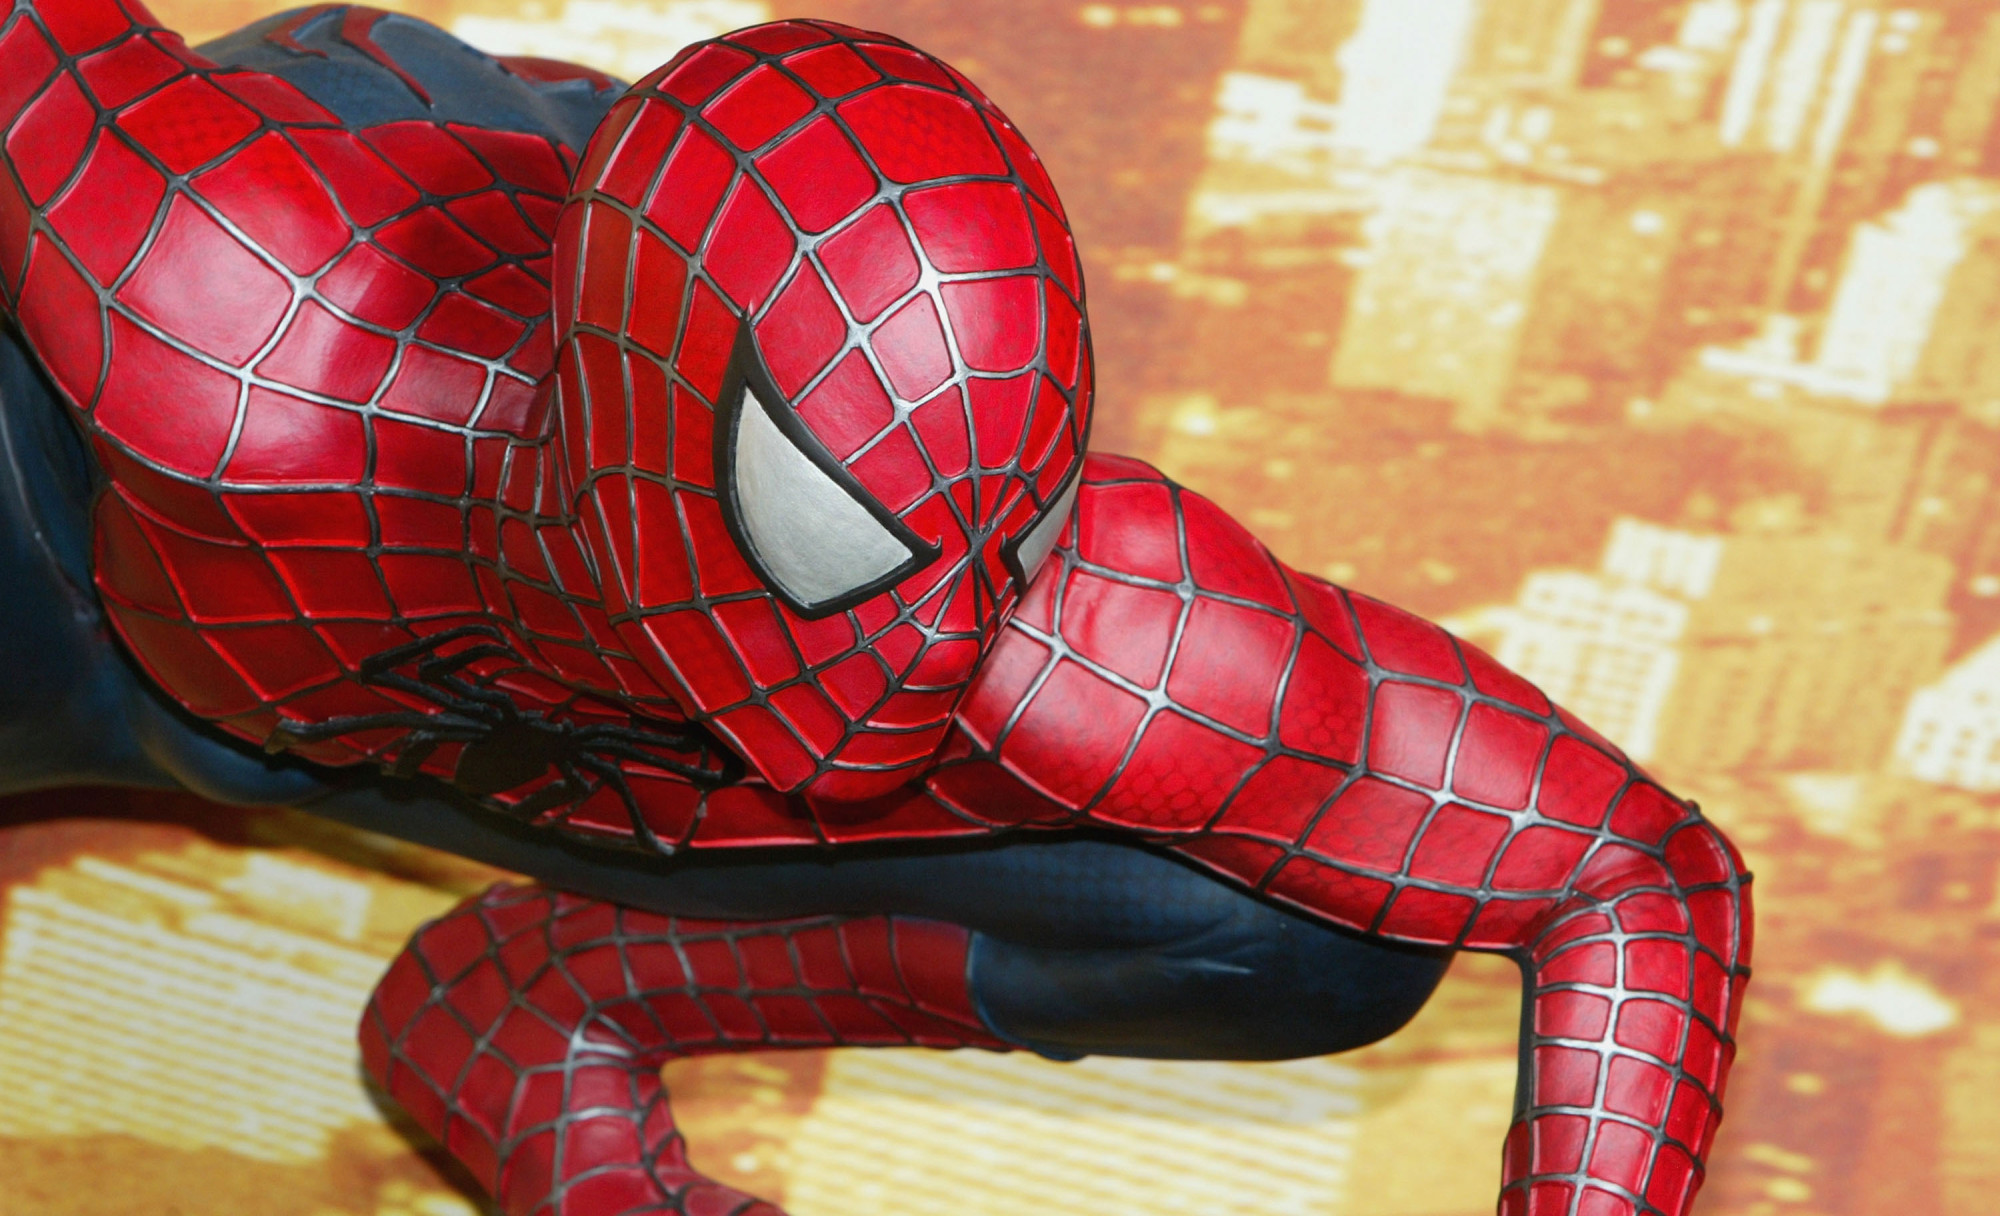 Spiderman will make u gay